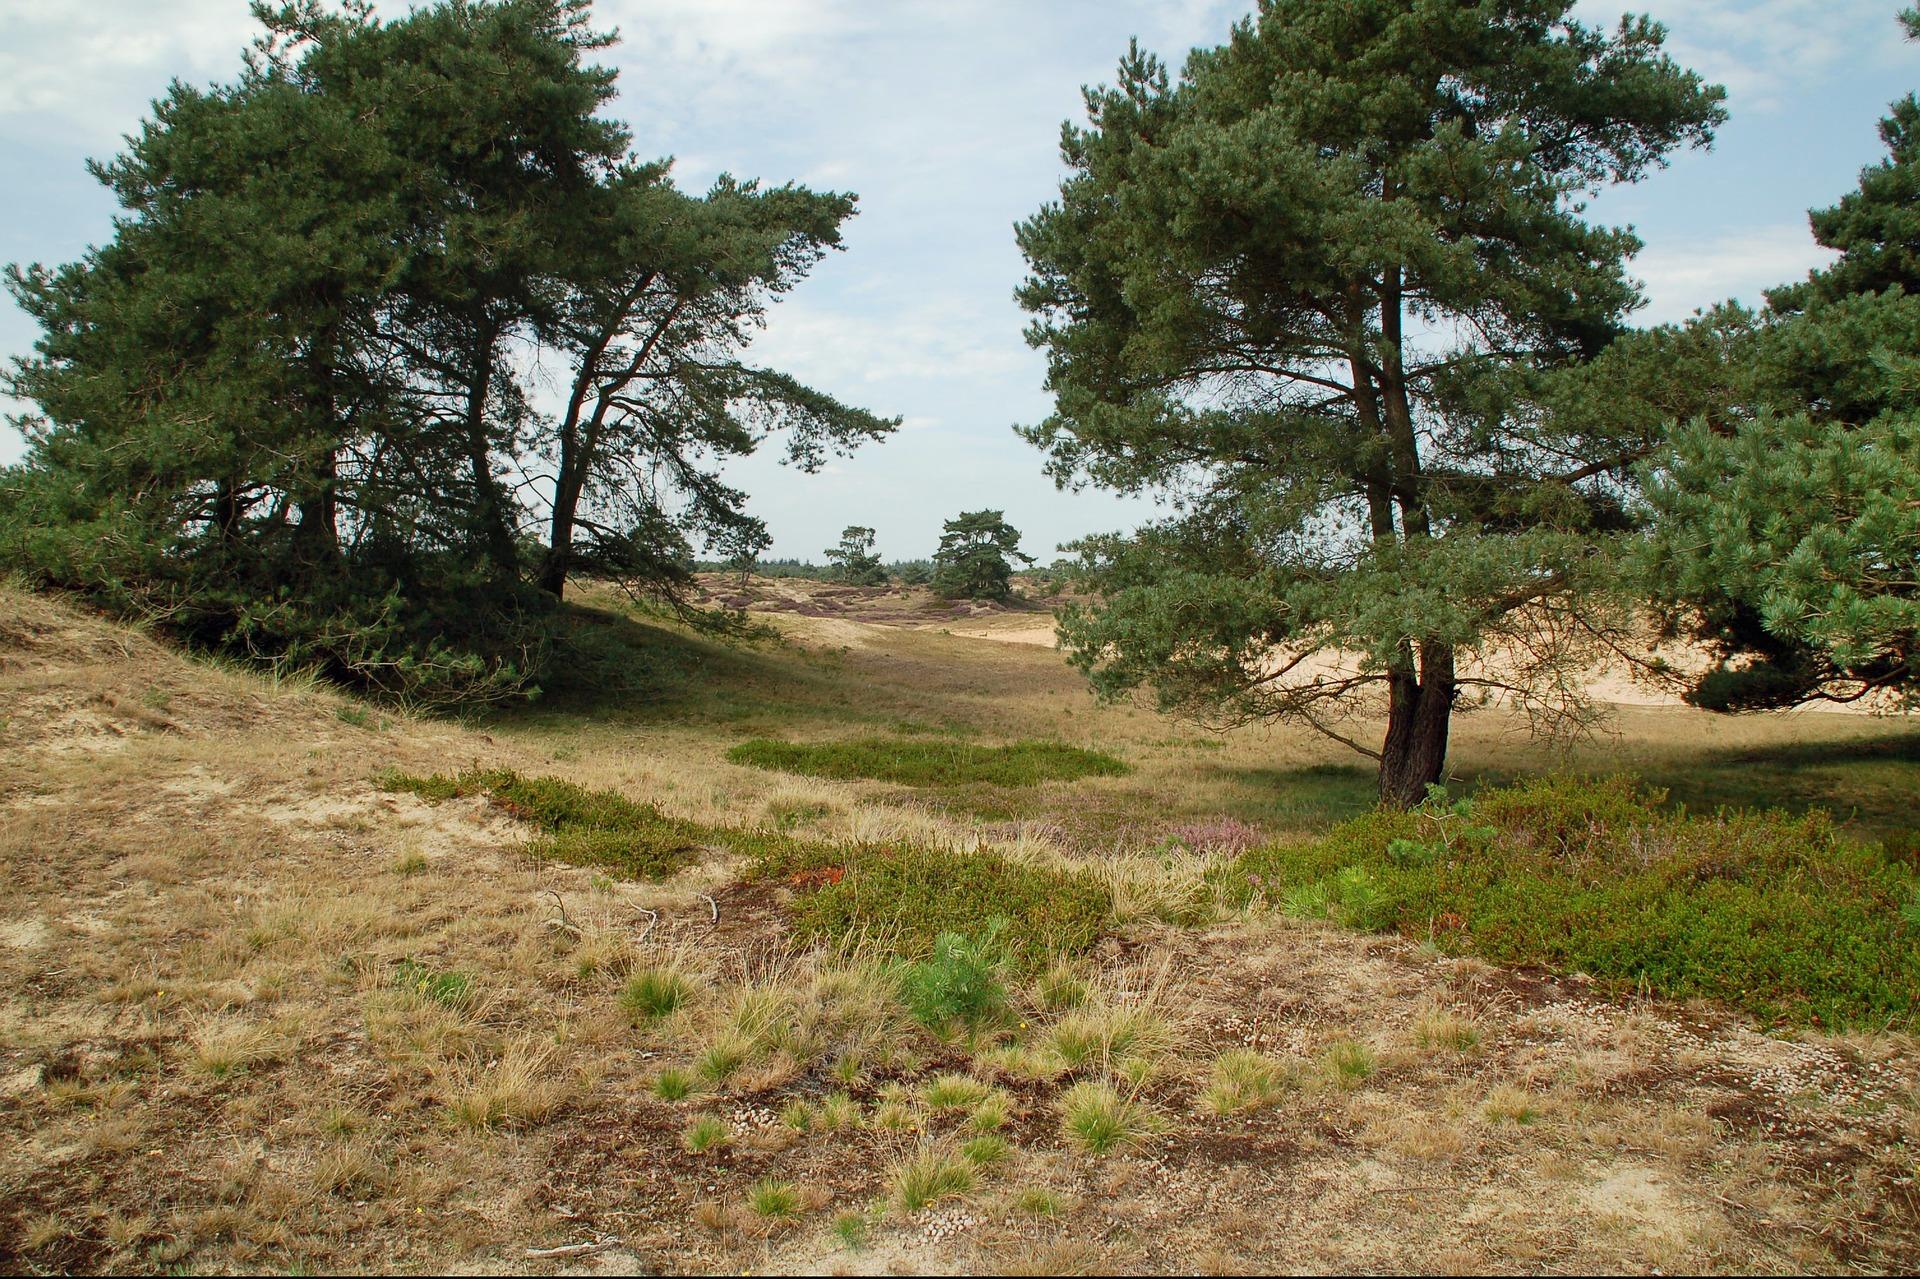 Nationaal Park het Drents Friese Wold